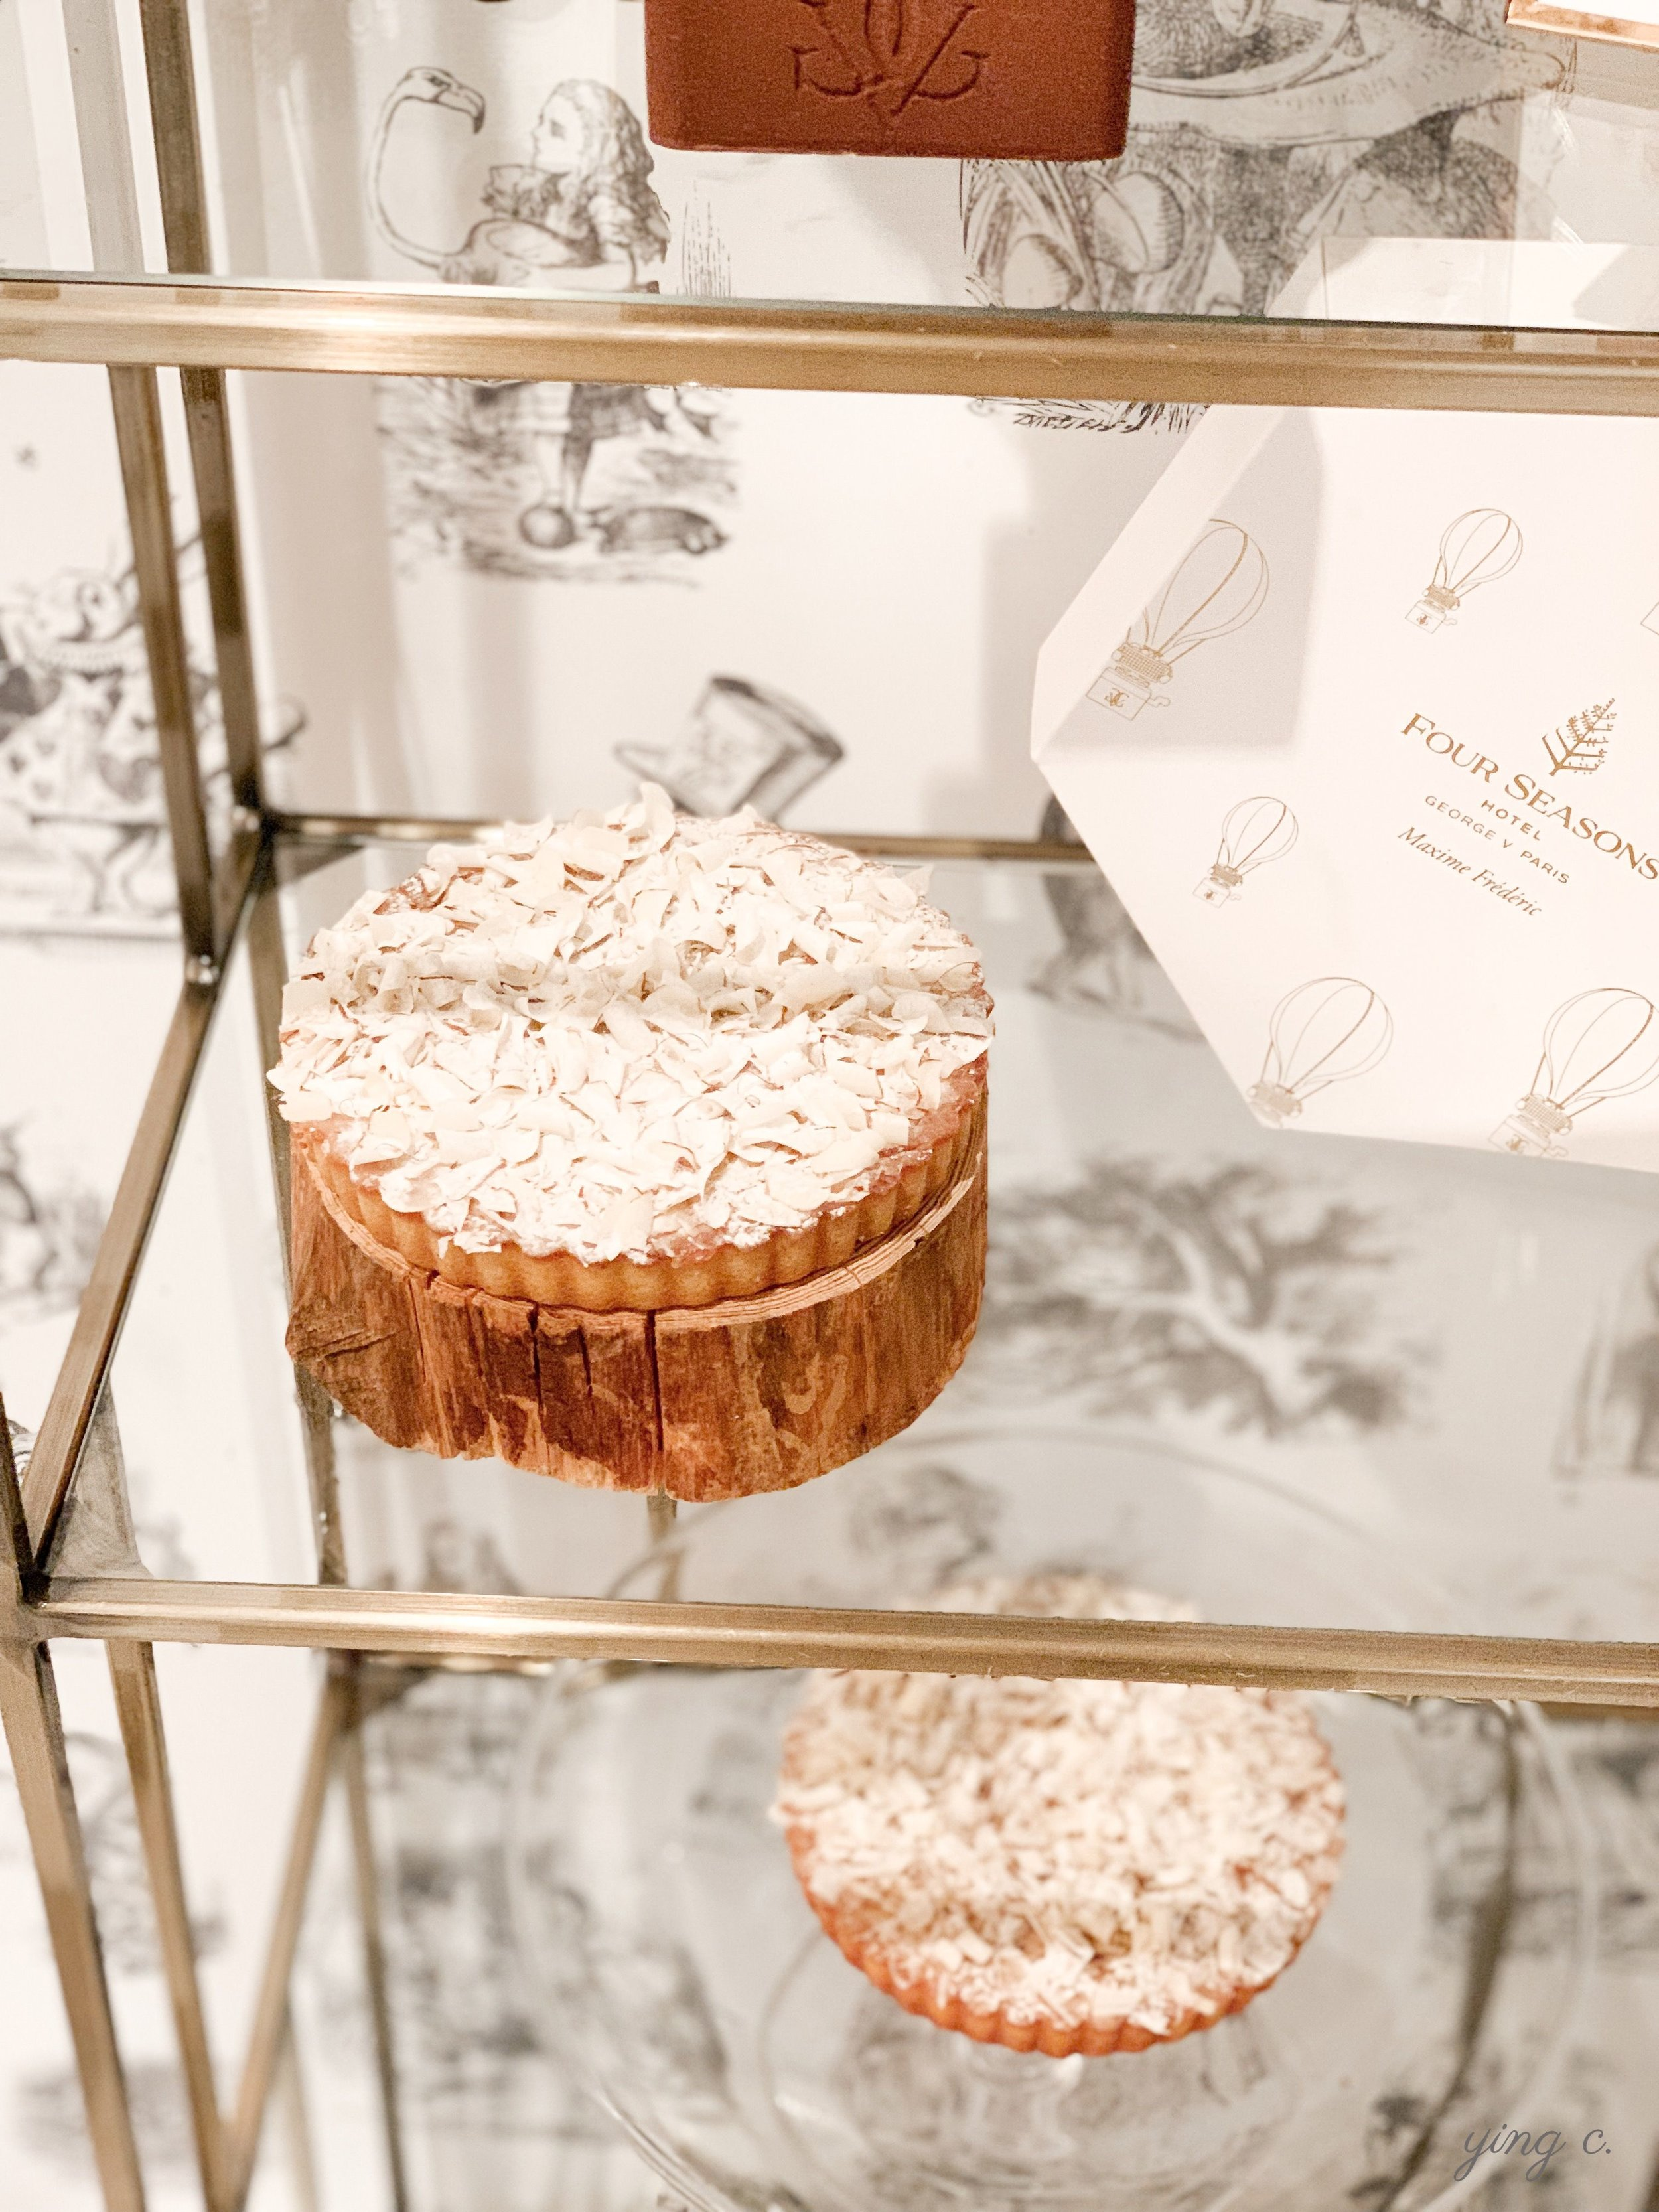 gâteau Nantais / 南特蛋糕